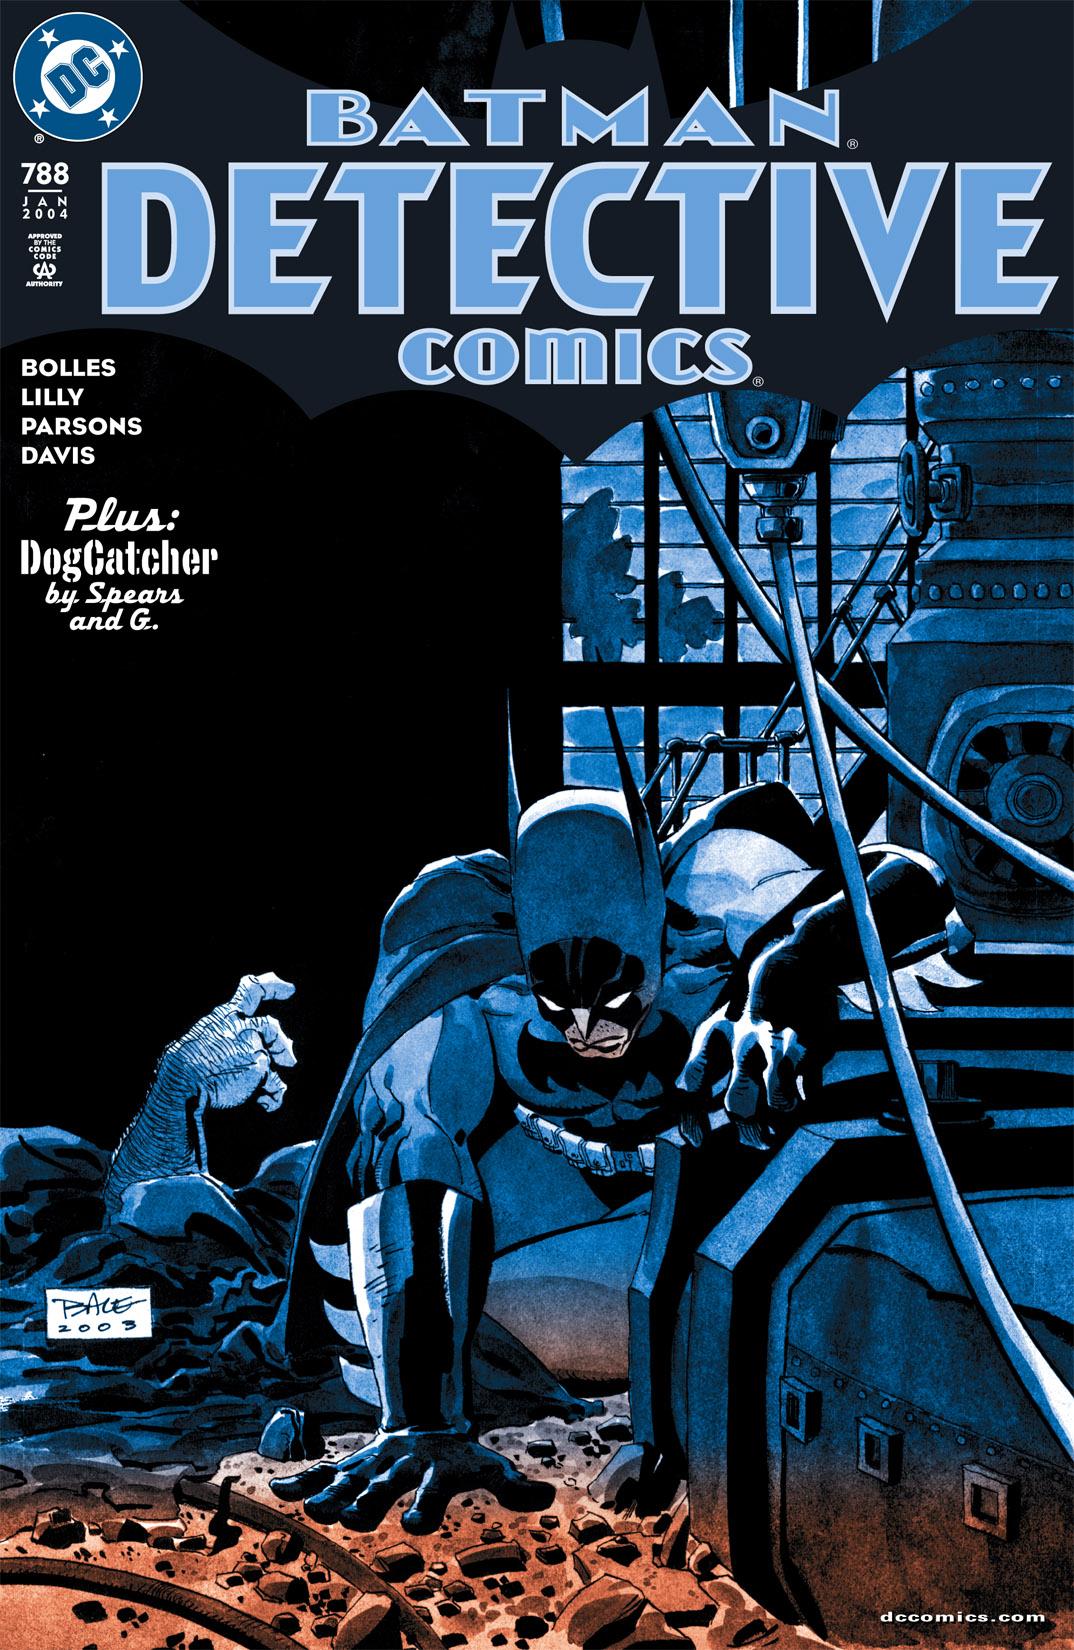 Detective Comics (1937) 788 Page 1